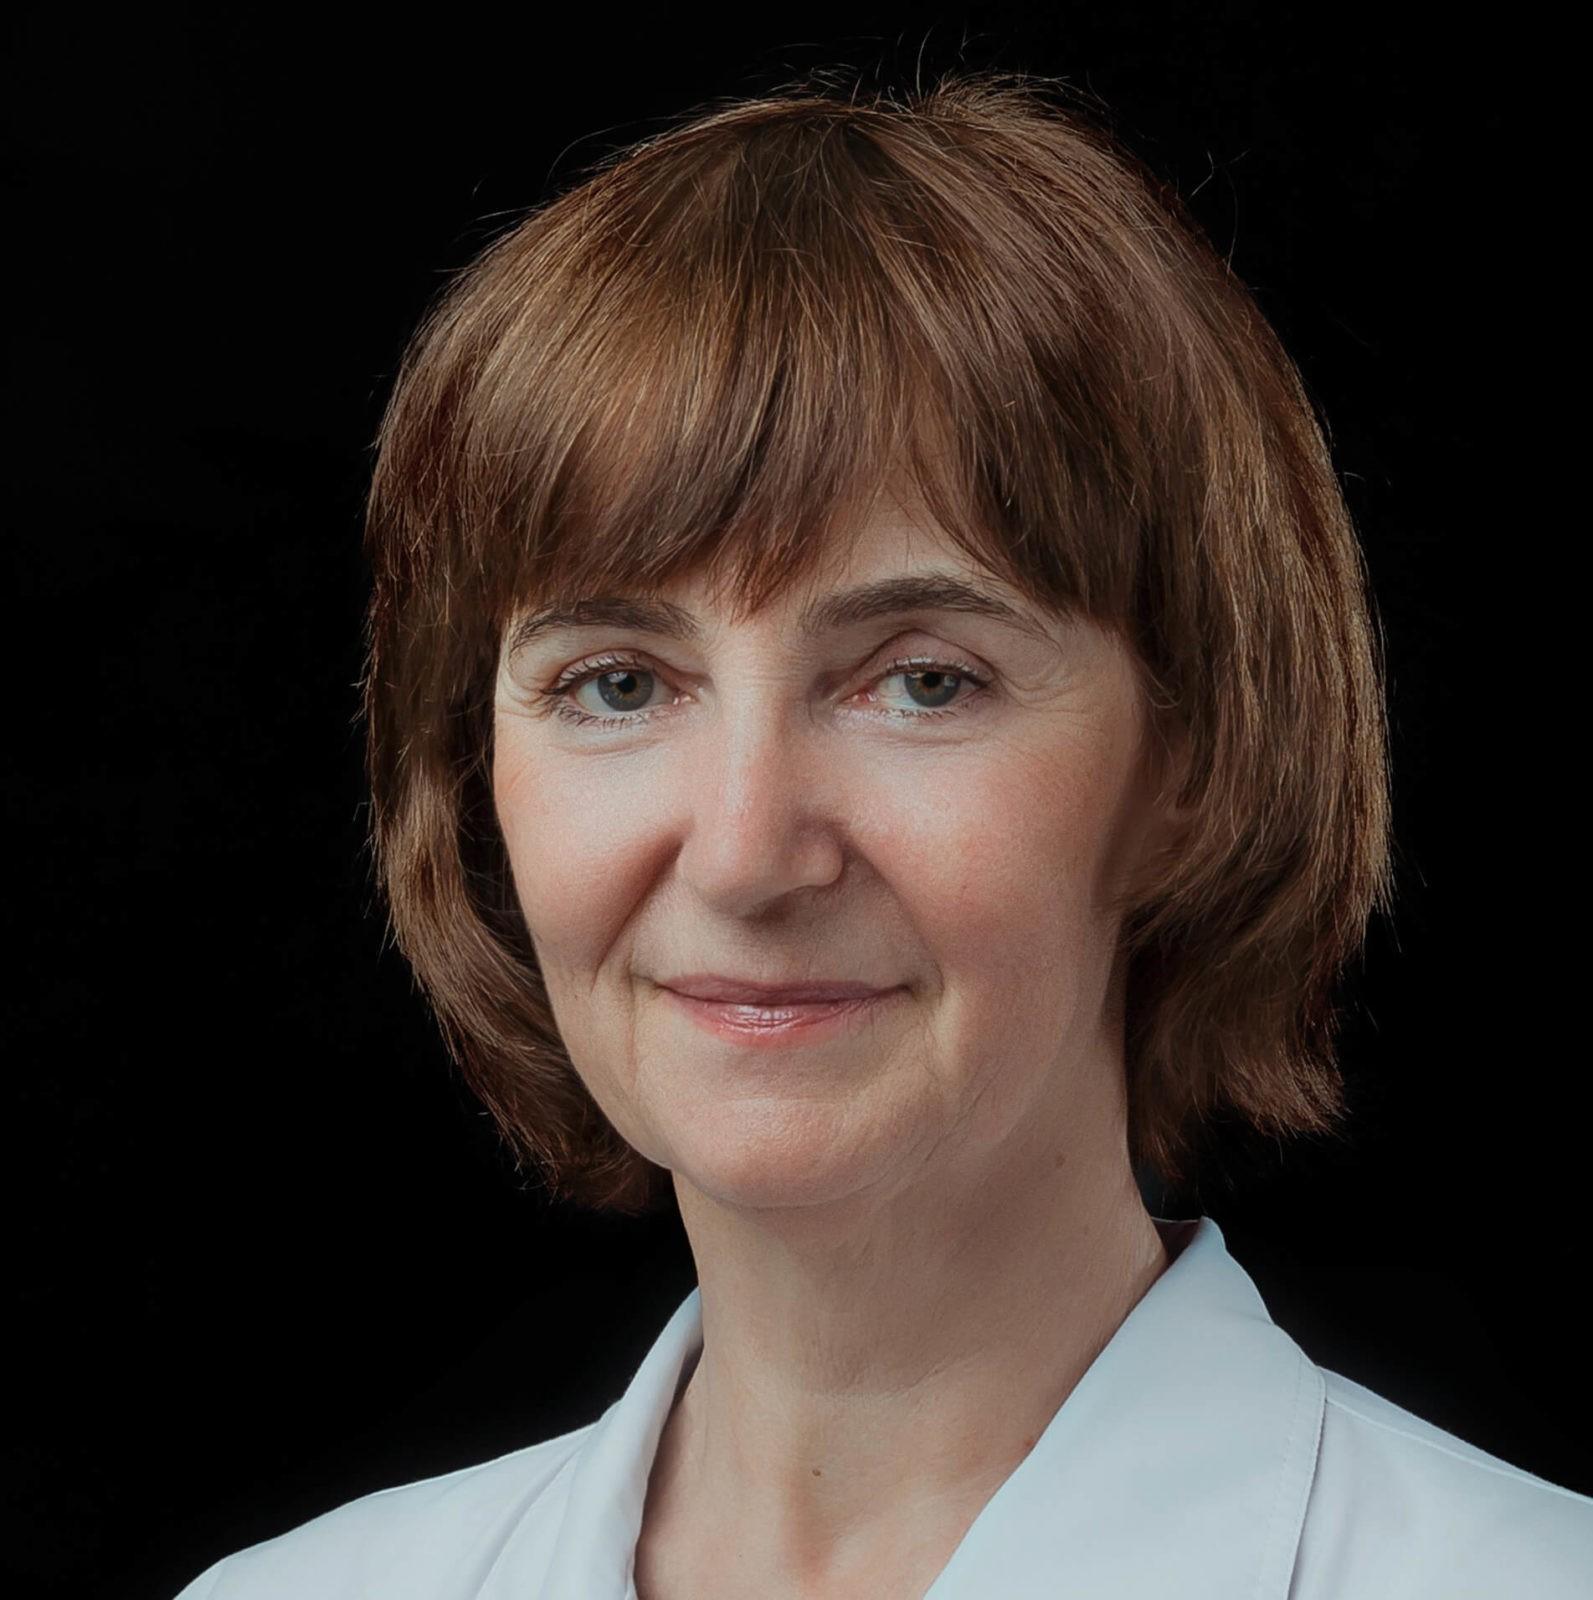 Светлана Хубирьянц